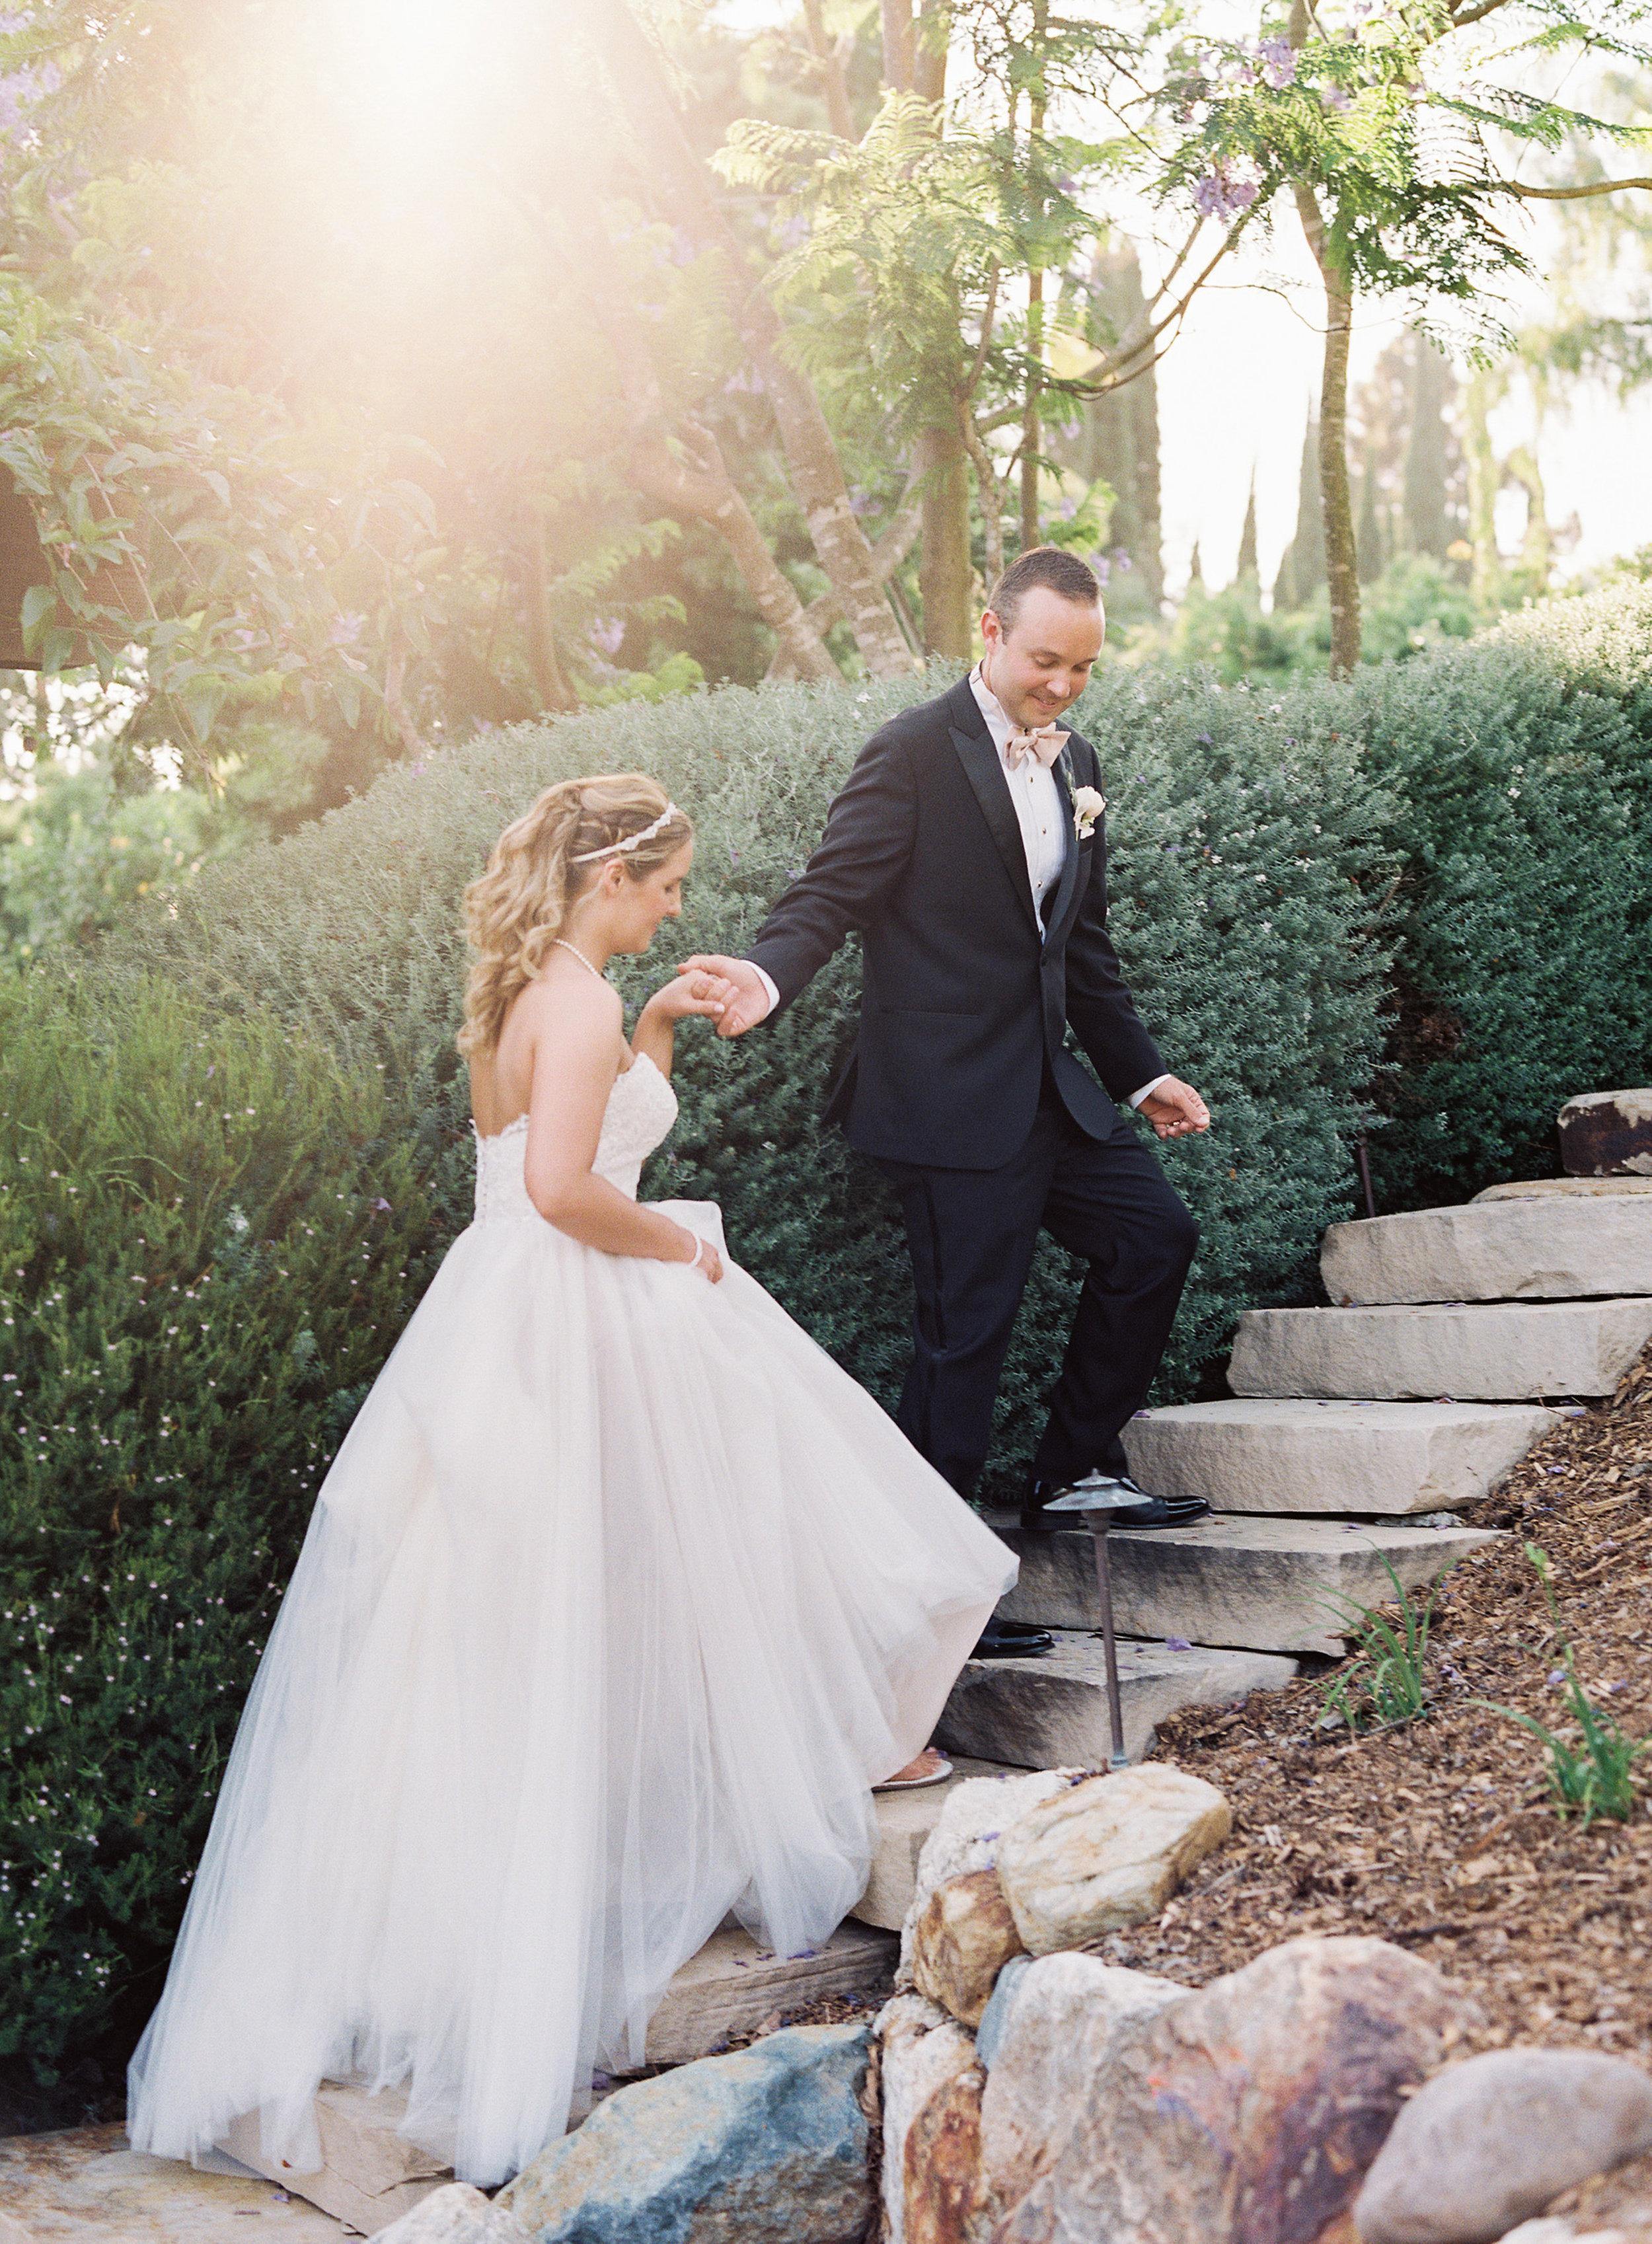 Braden-Hannah-Married-462.jpg